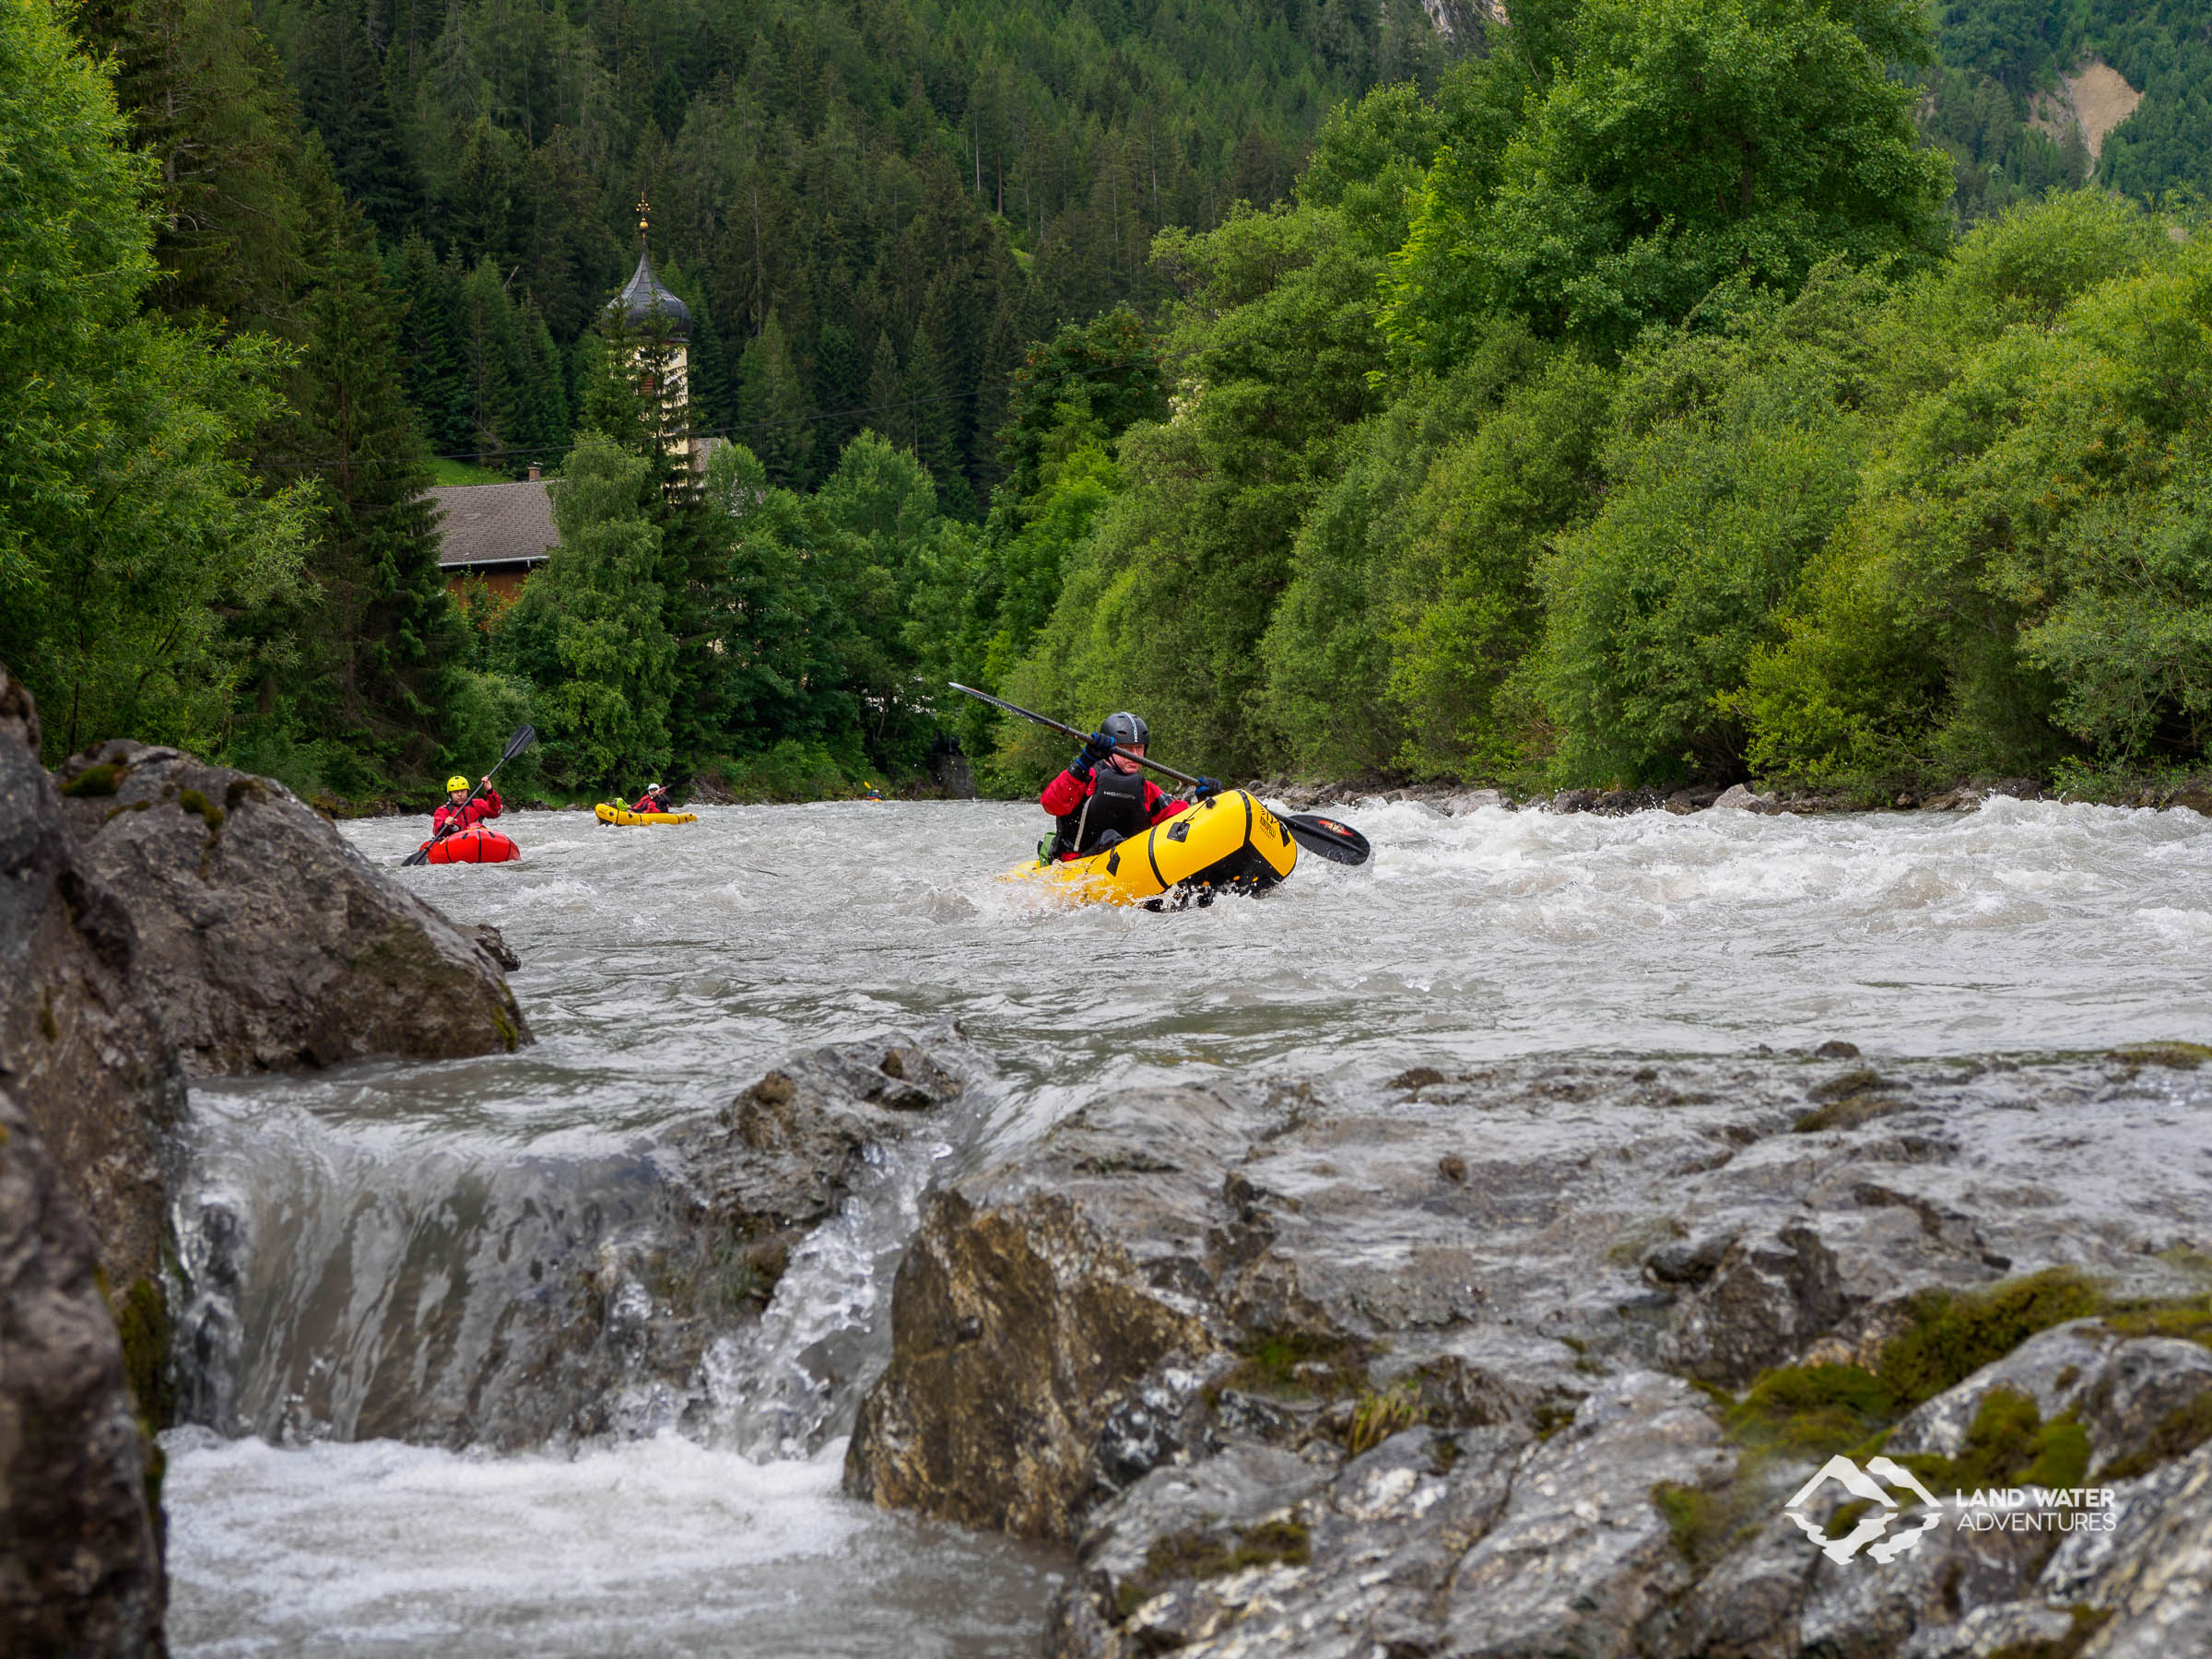 Whitewater Packrafting Course Tirol Lech © Land Water Adventures